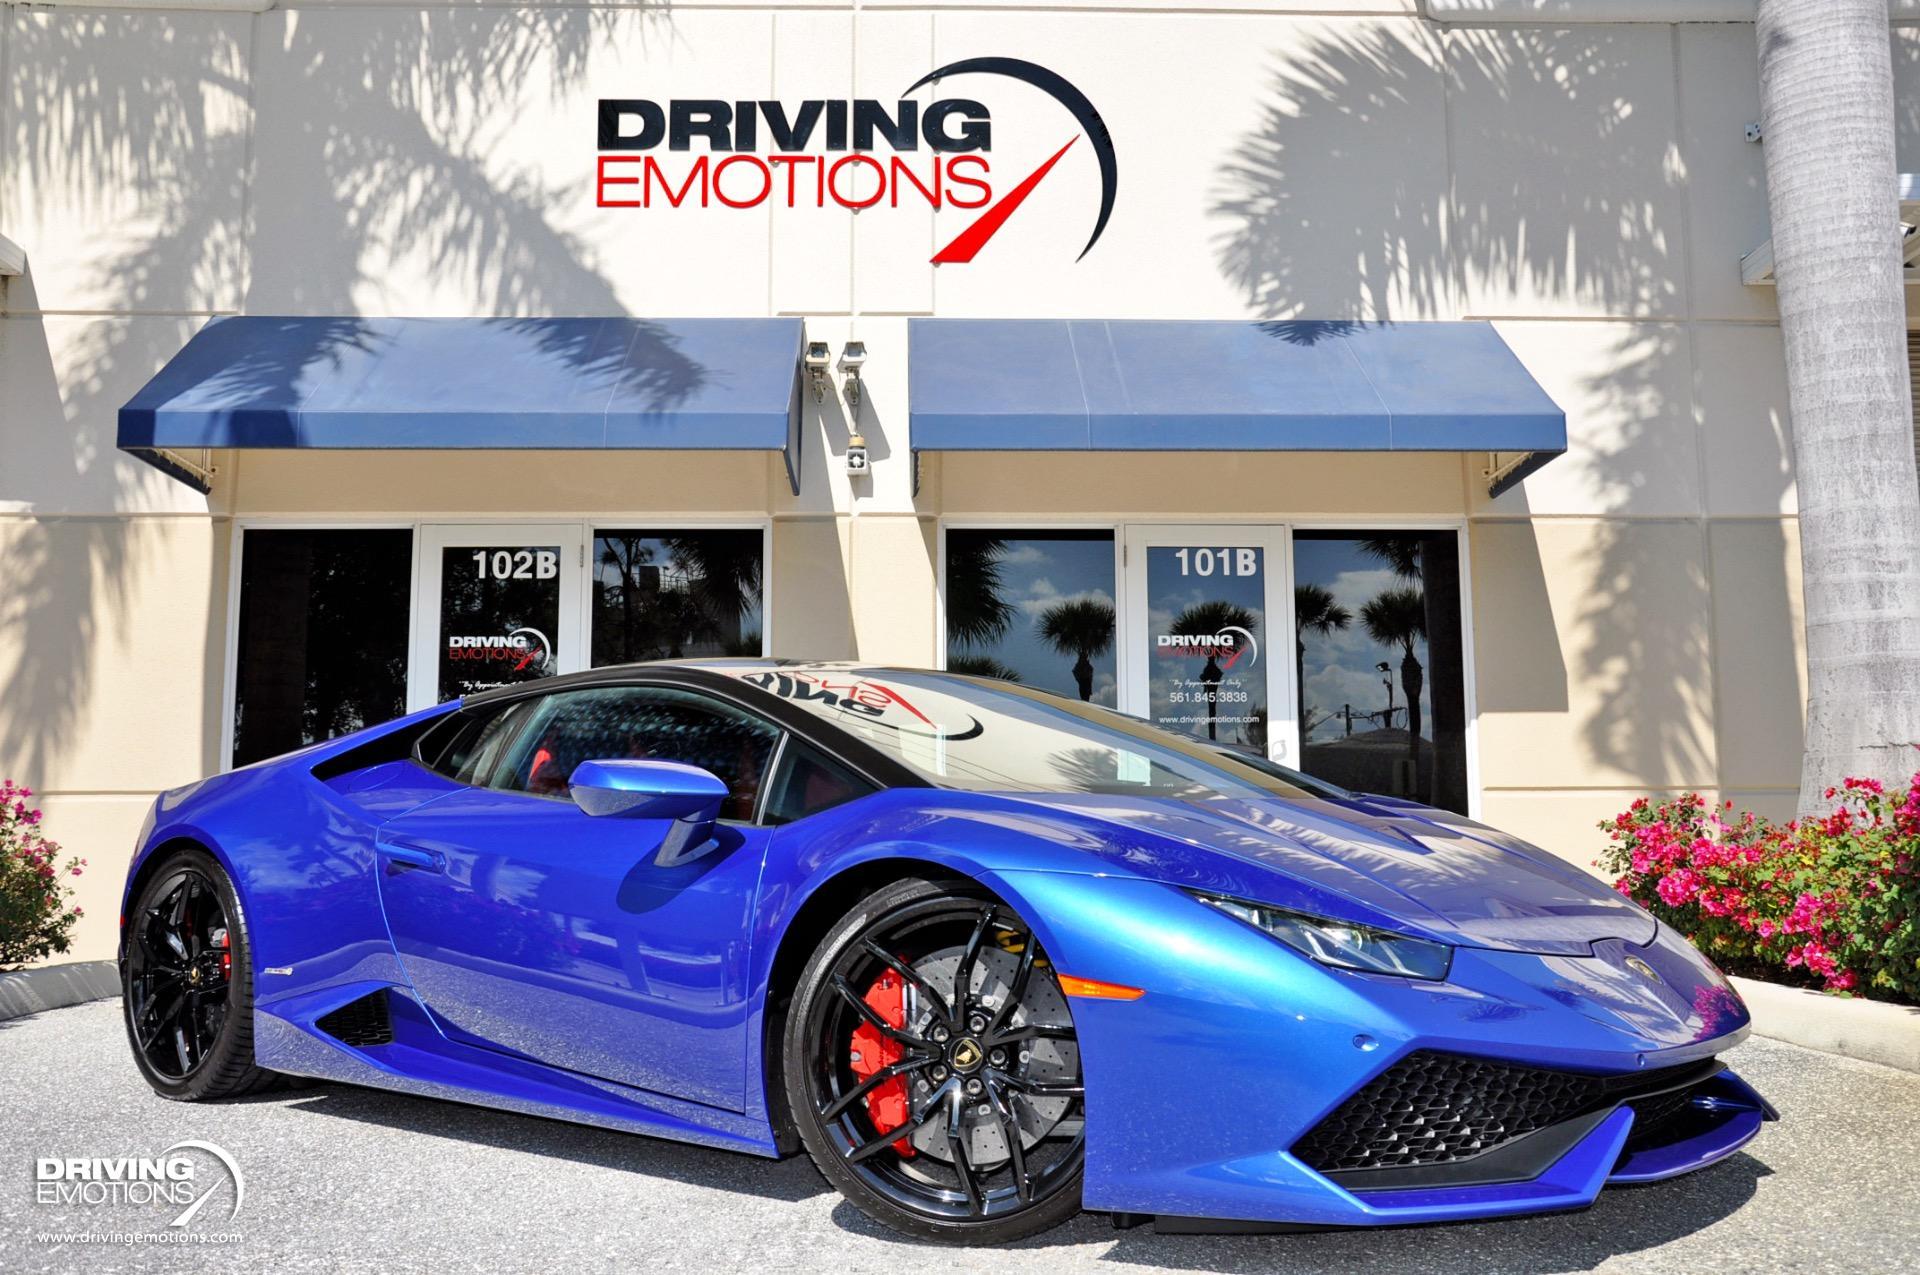 2015 Lamborghini Huracan Lp610 4 Lp 610 4 Stock 6042 For Sale Near